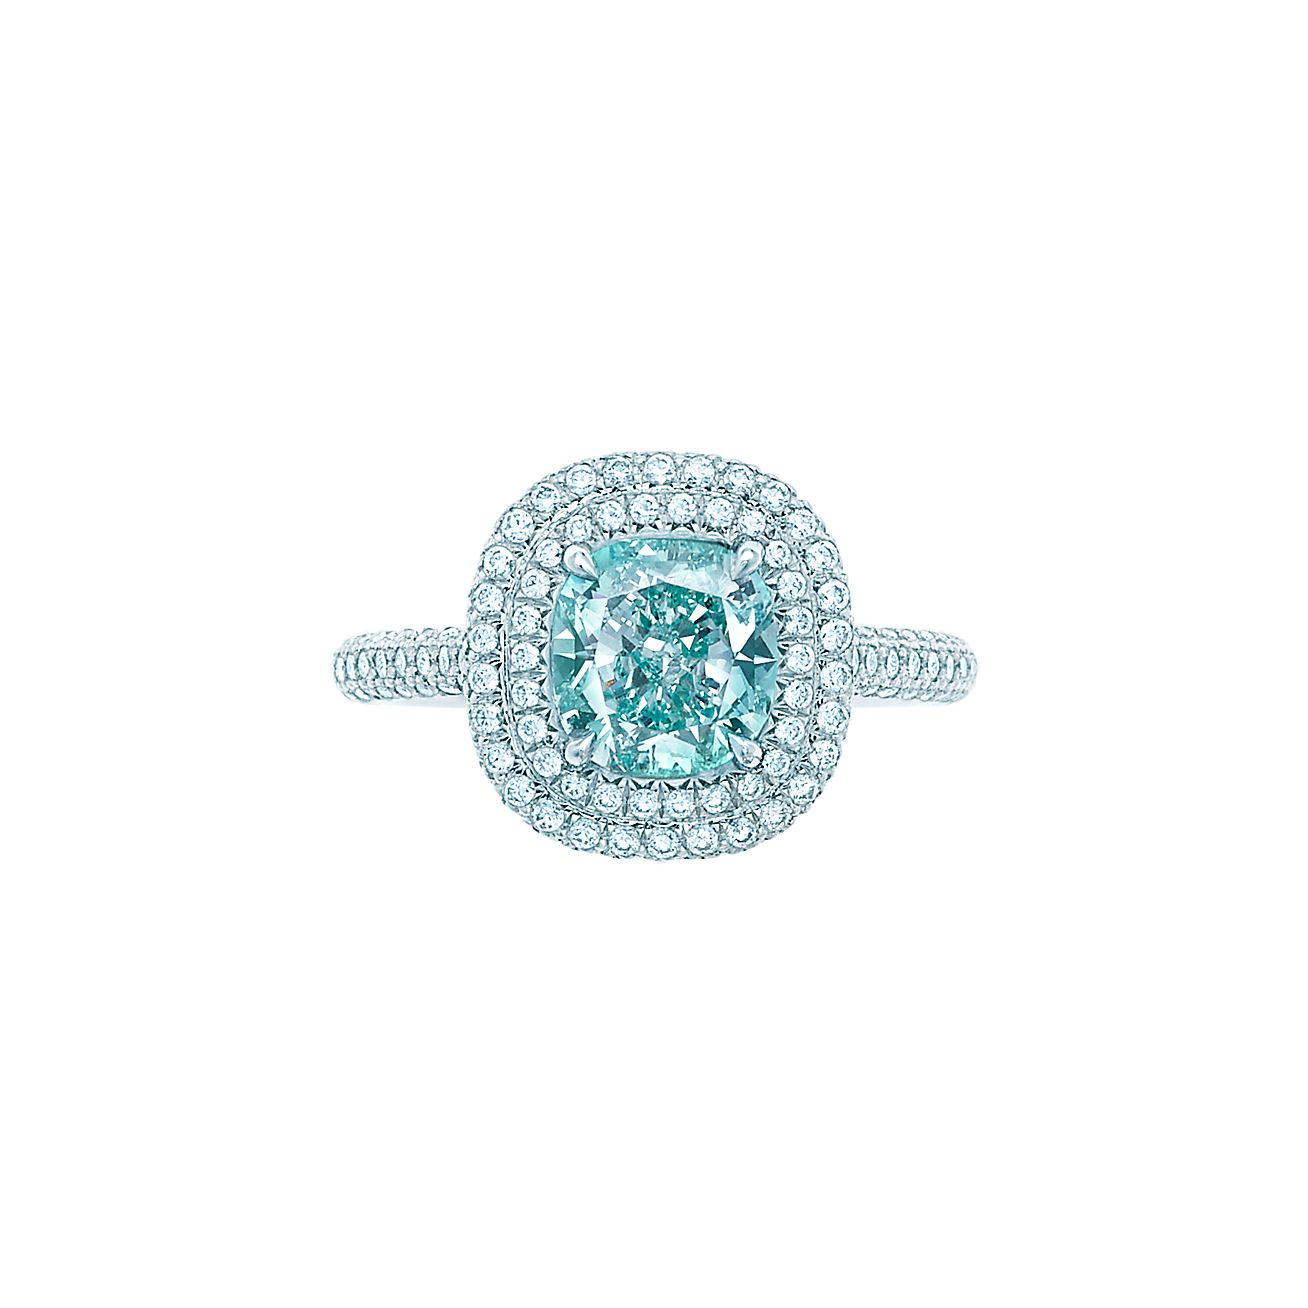 Tiffany Soleste® ring with a 1.66-carat Fancy Intense Bluish Green diamond.    Tiffany & Co.